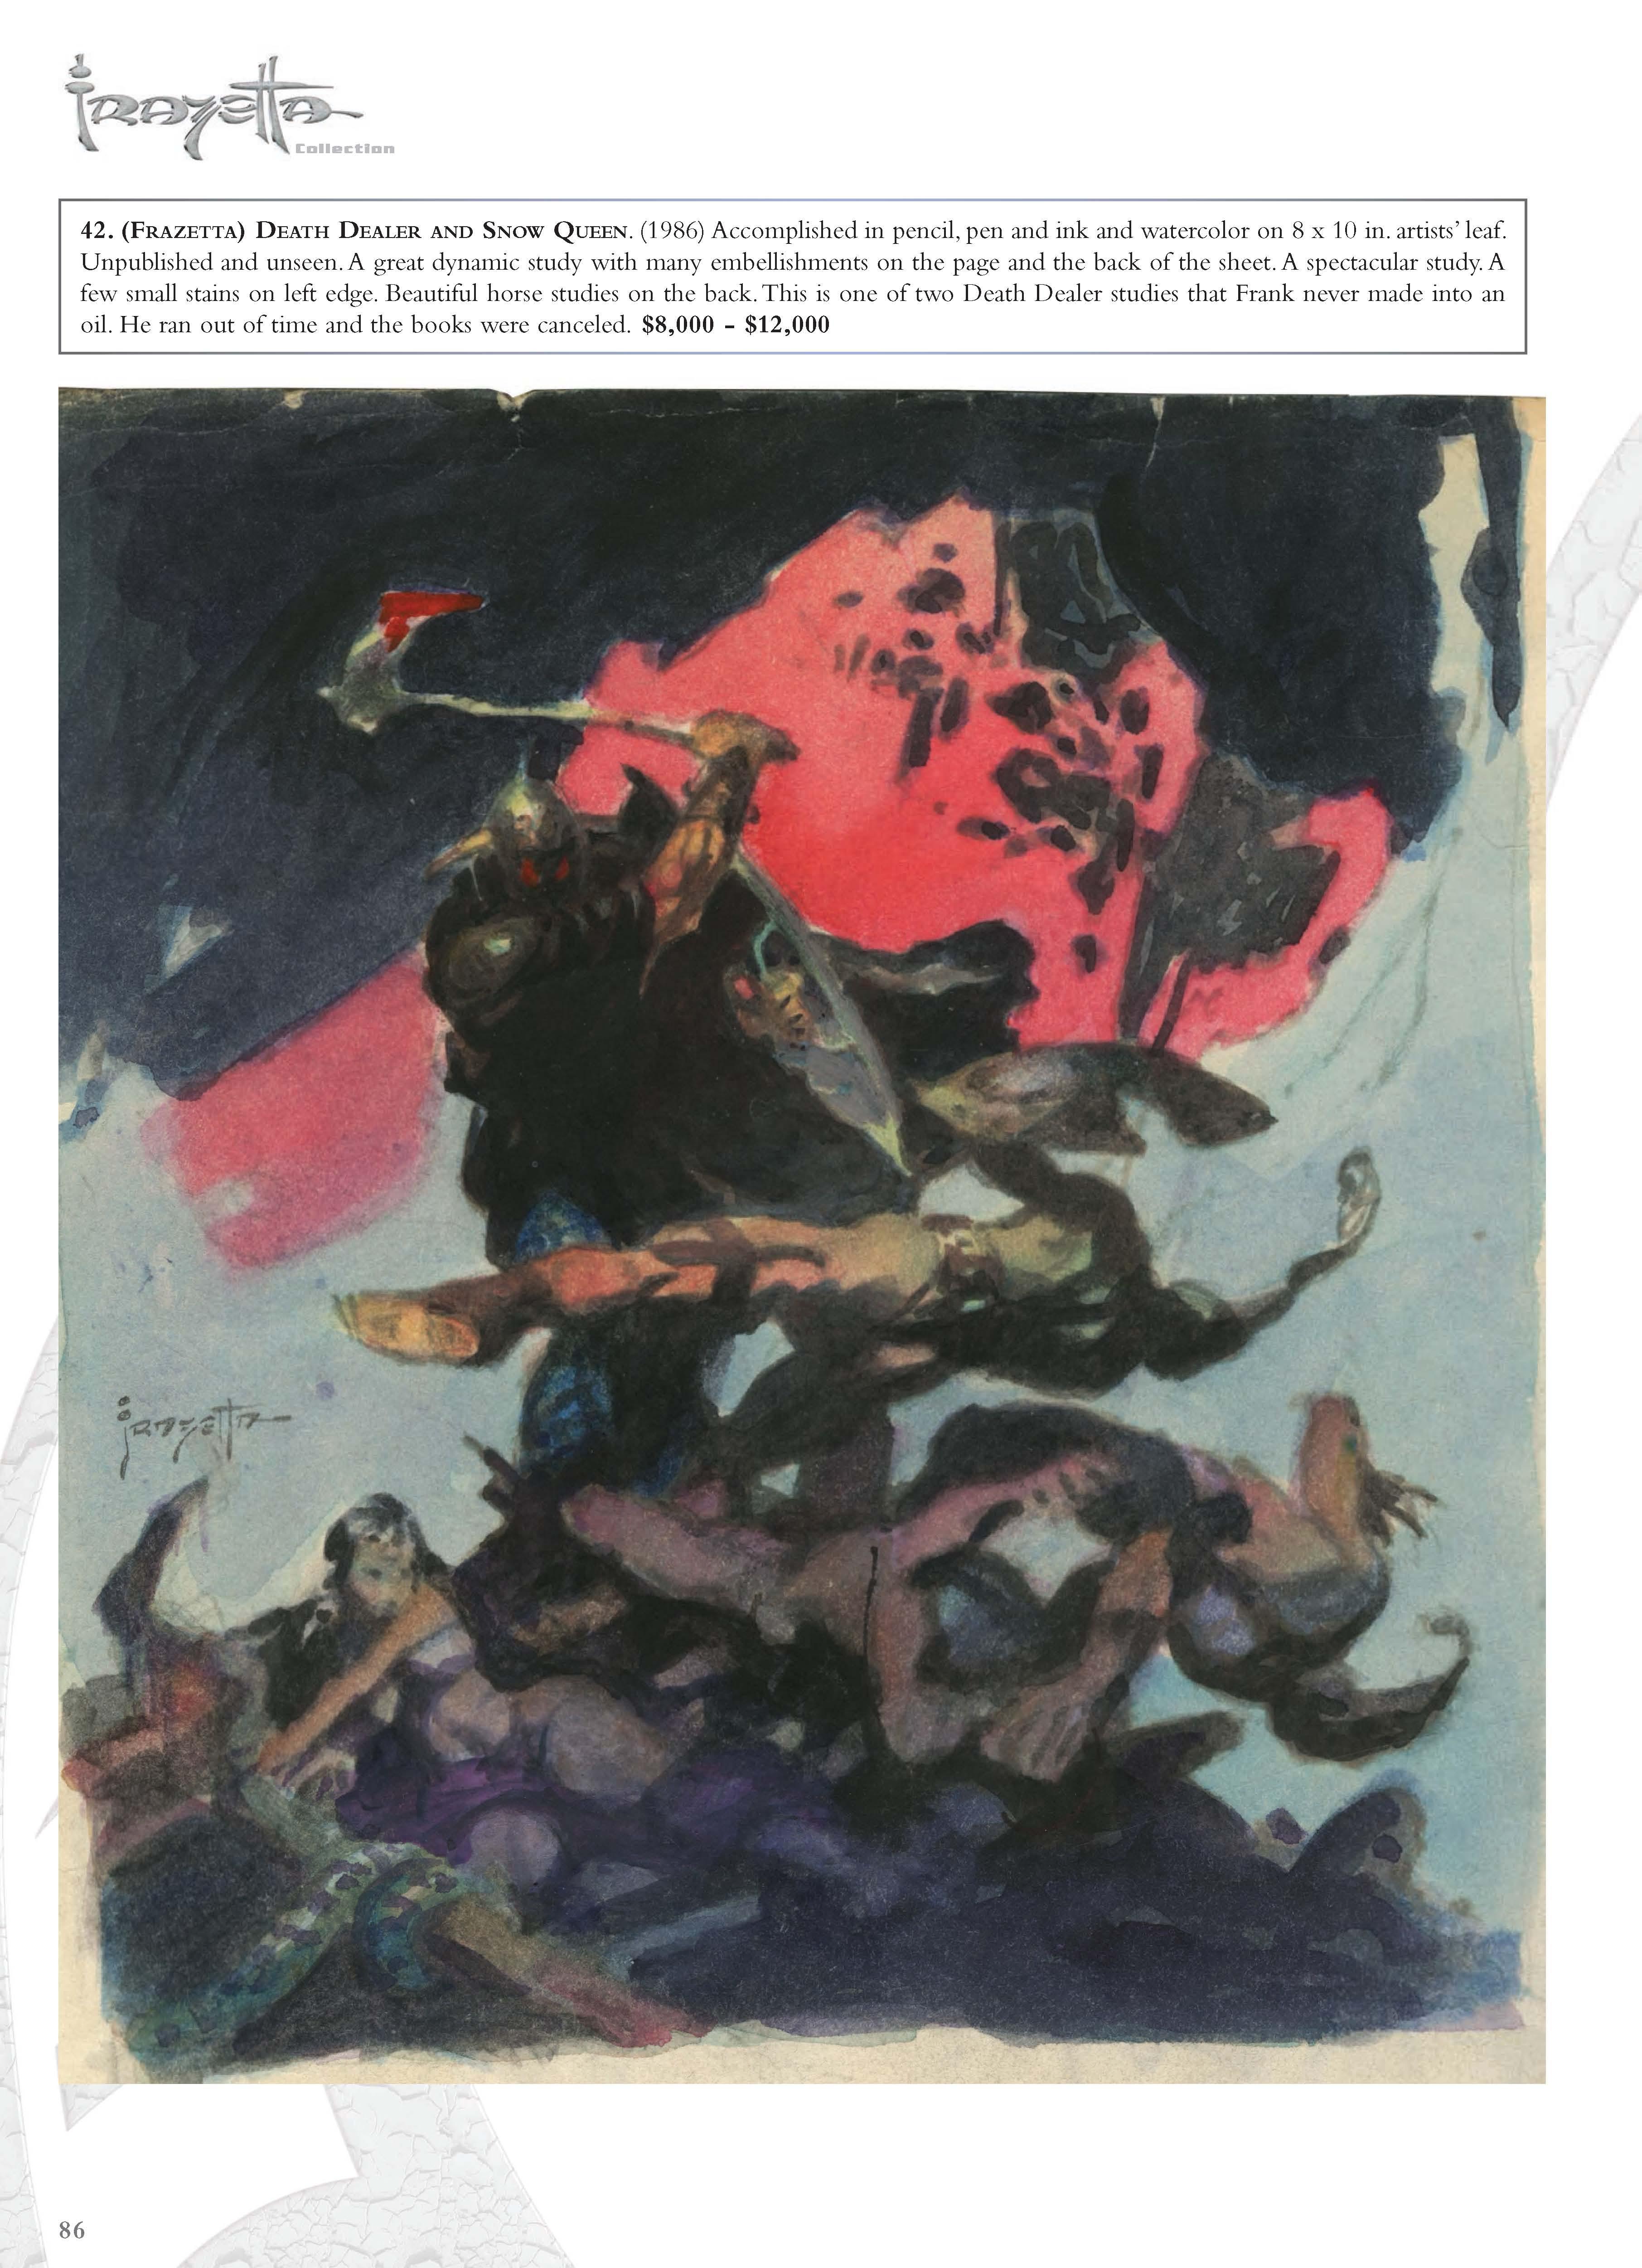 Illustration Mid To Late 20th Century Illustrators Doc Dave Winiewicz Frazetta Collection